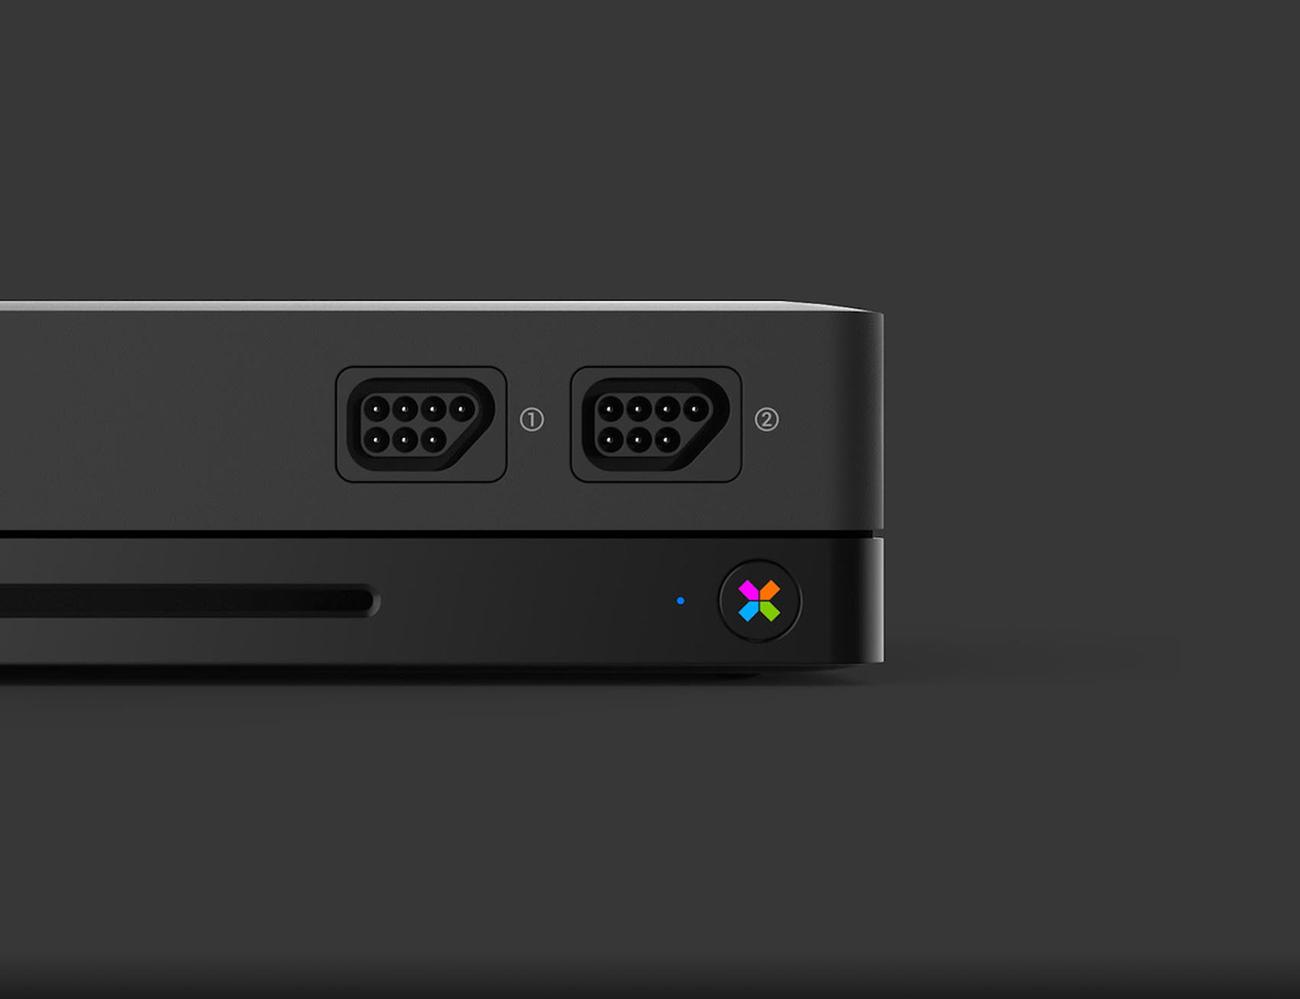 Retroblox Modular Hd Retro Game Console Gadget Flow